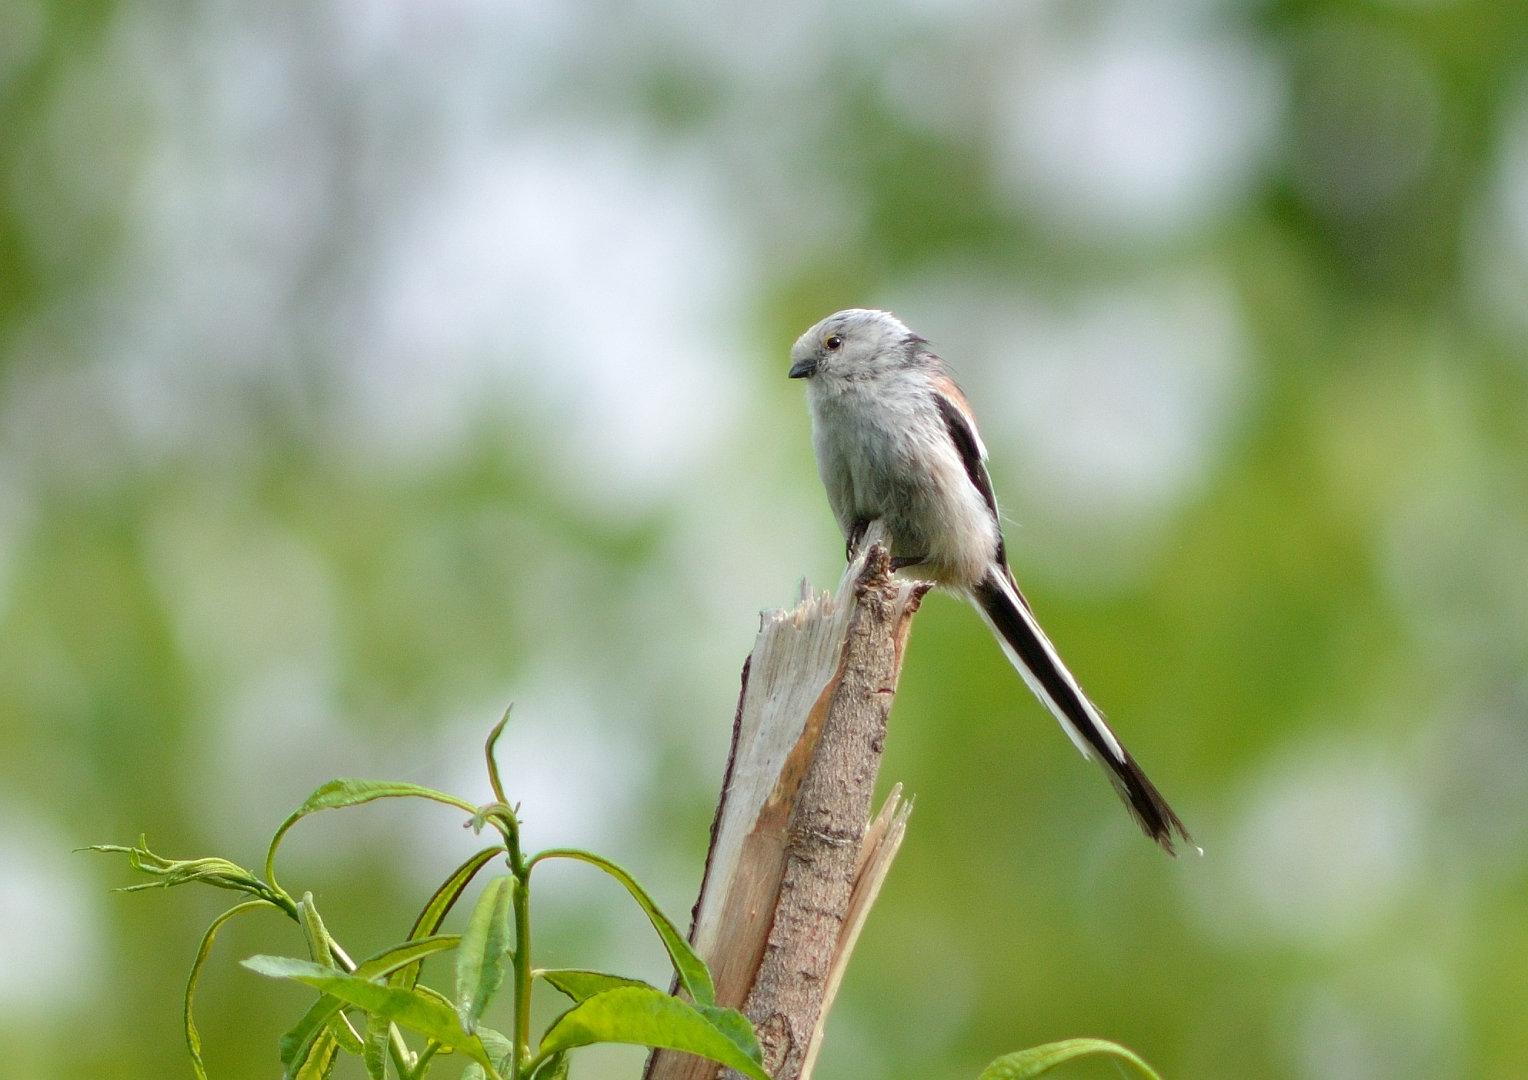 BORG71FLで撮影した野鳥・シマエナガの写真画像